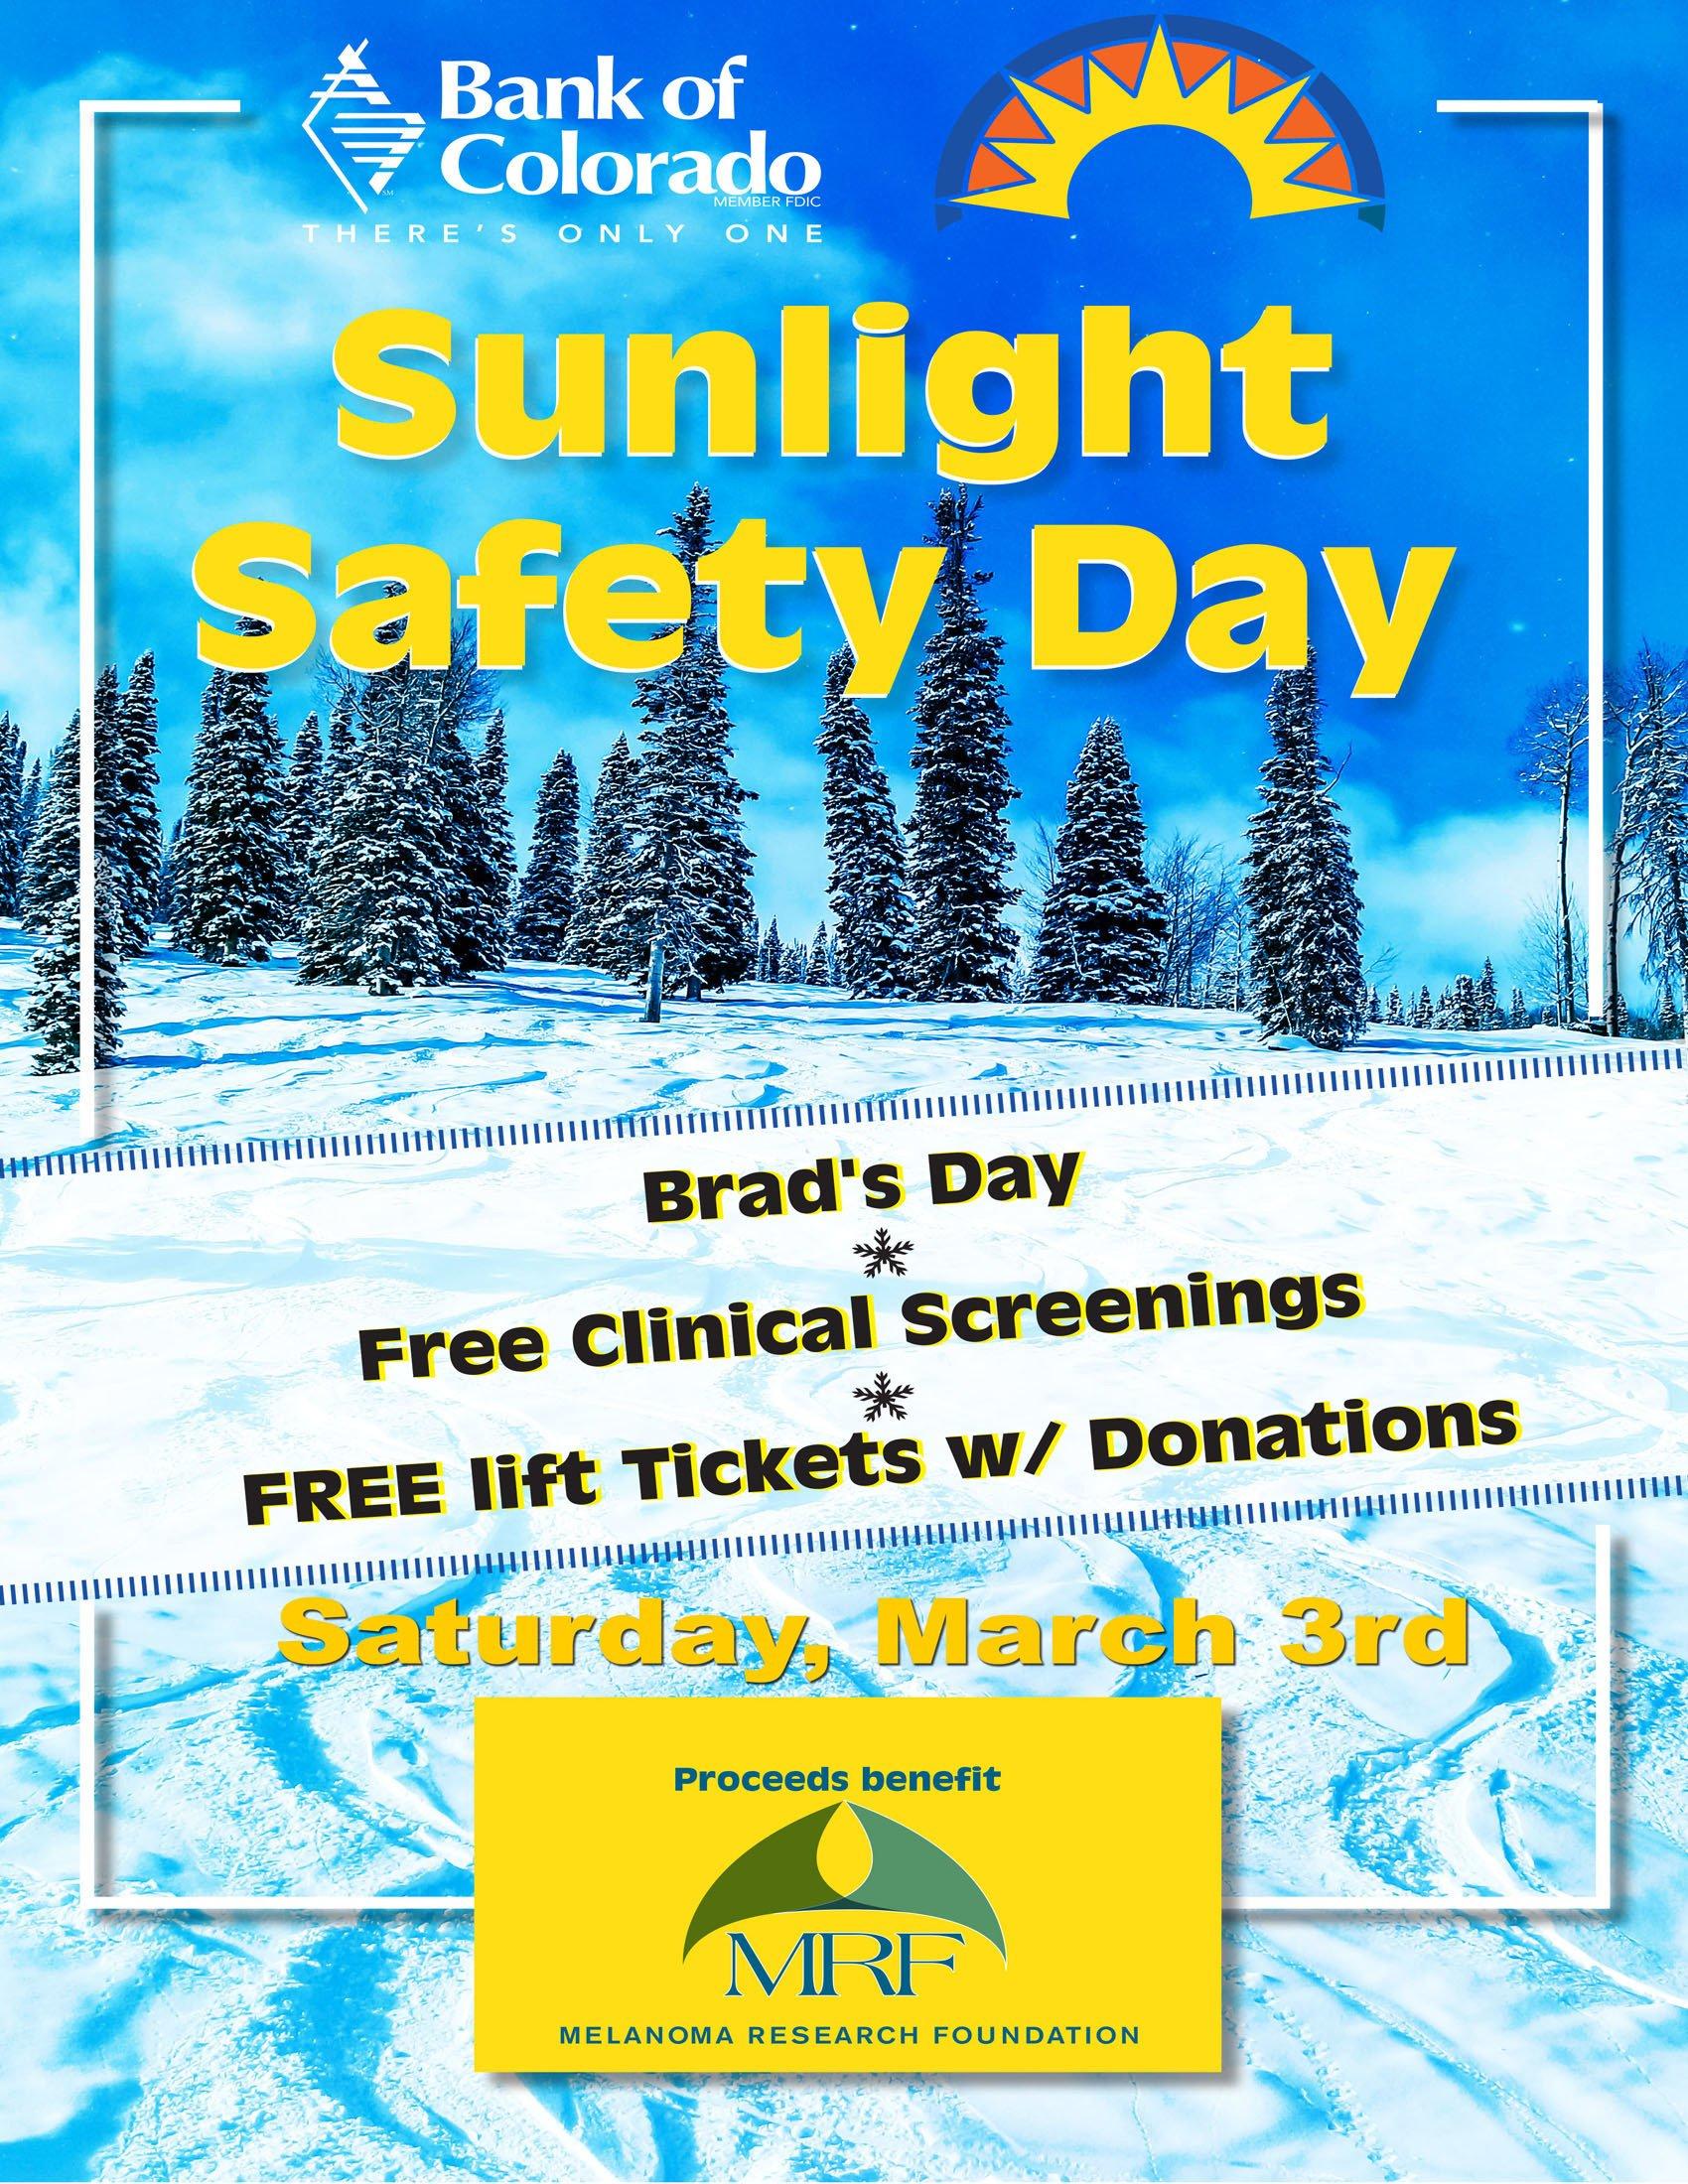 Safety/Brad's Day – The Sopris Sun